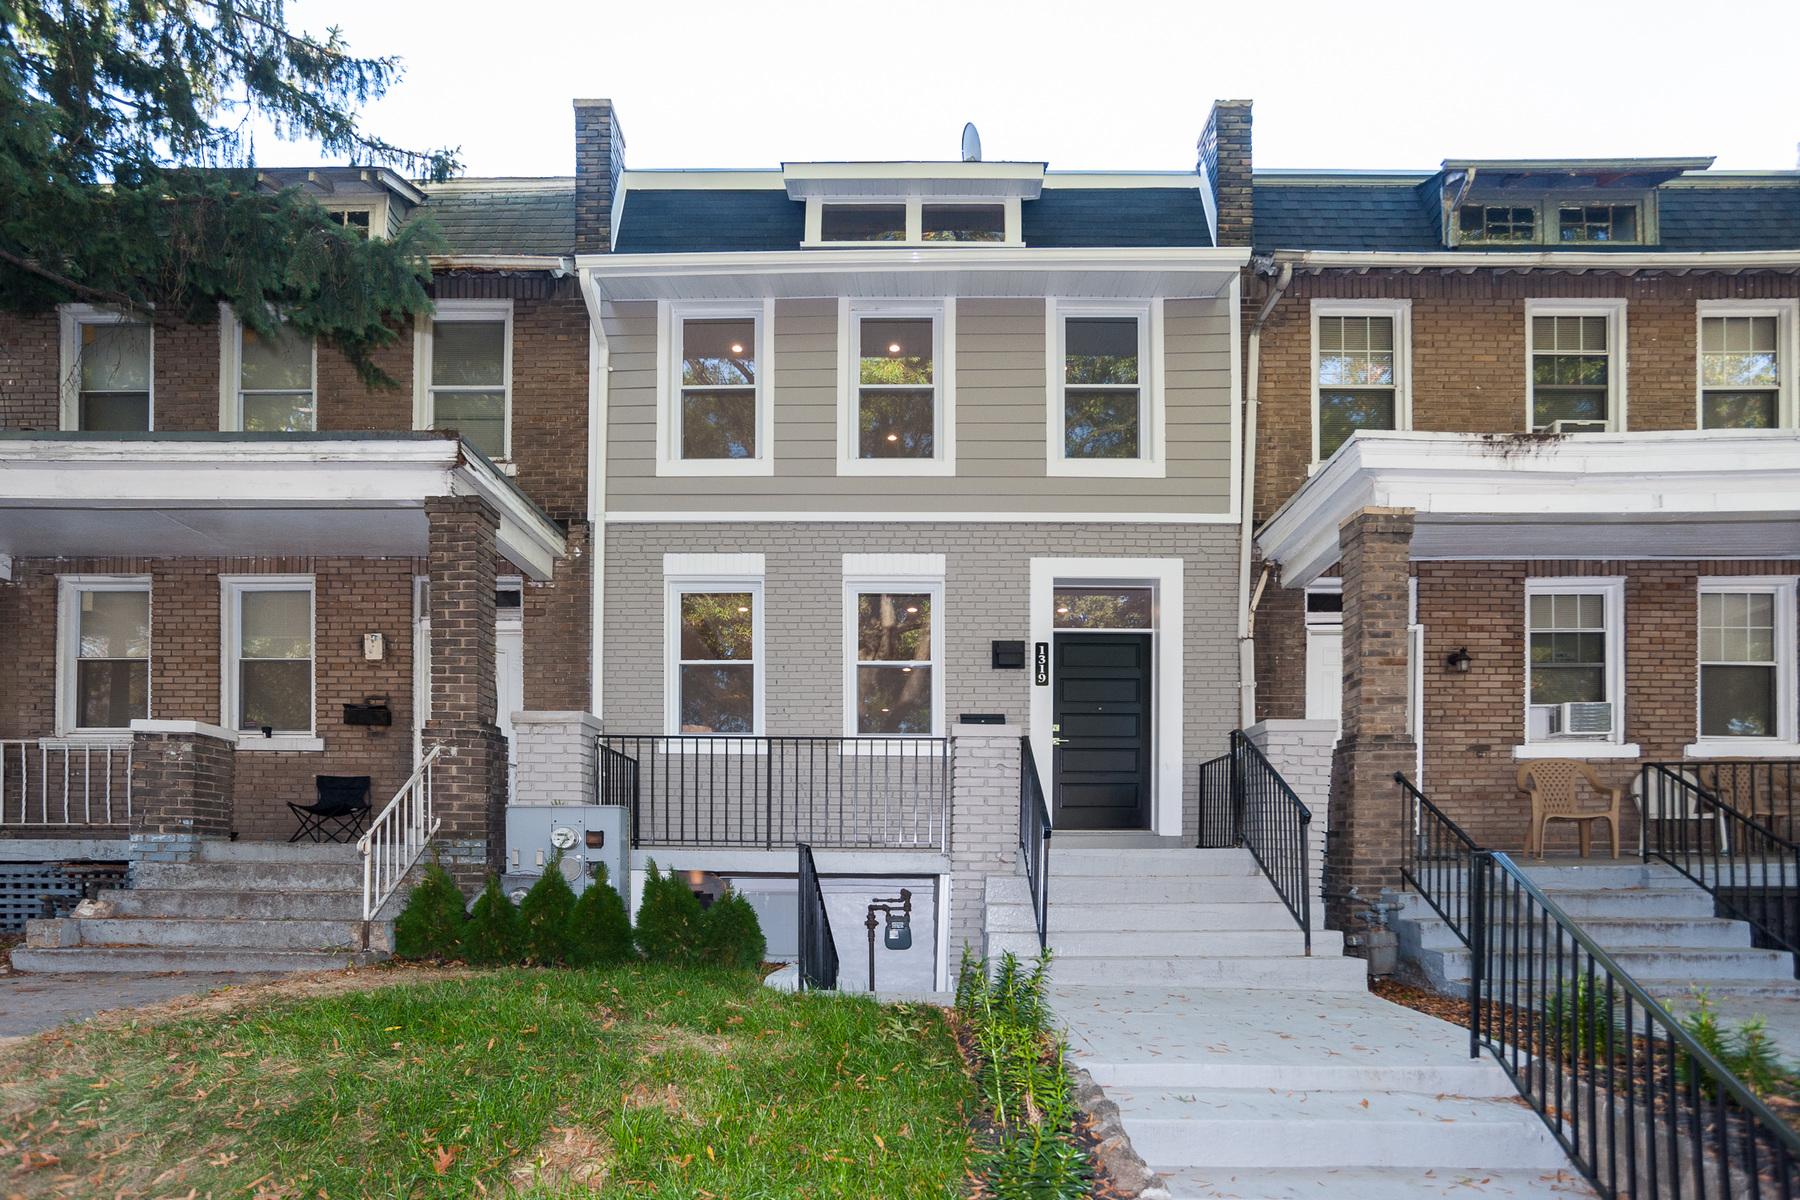 Townhouse for Sale at 1319 West Virginia Avenue Ne, Washington Washington, District Of Columbia 20002 United States